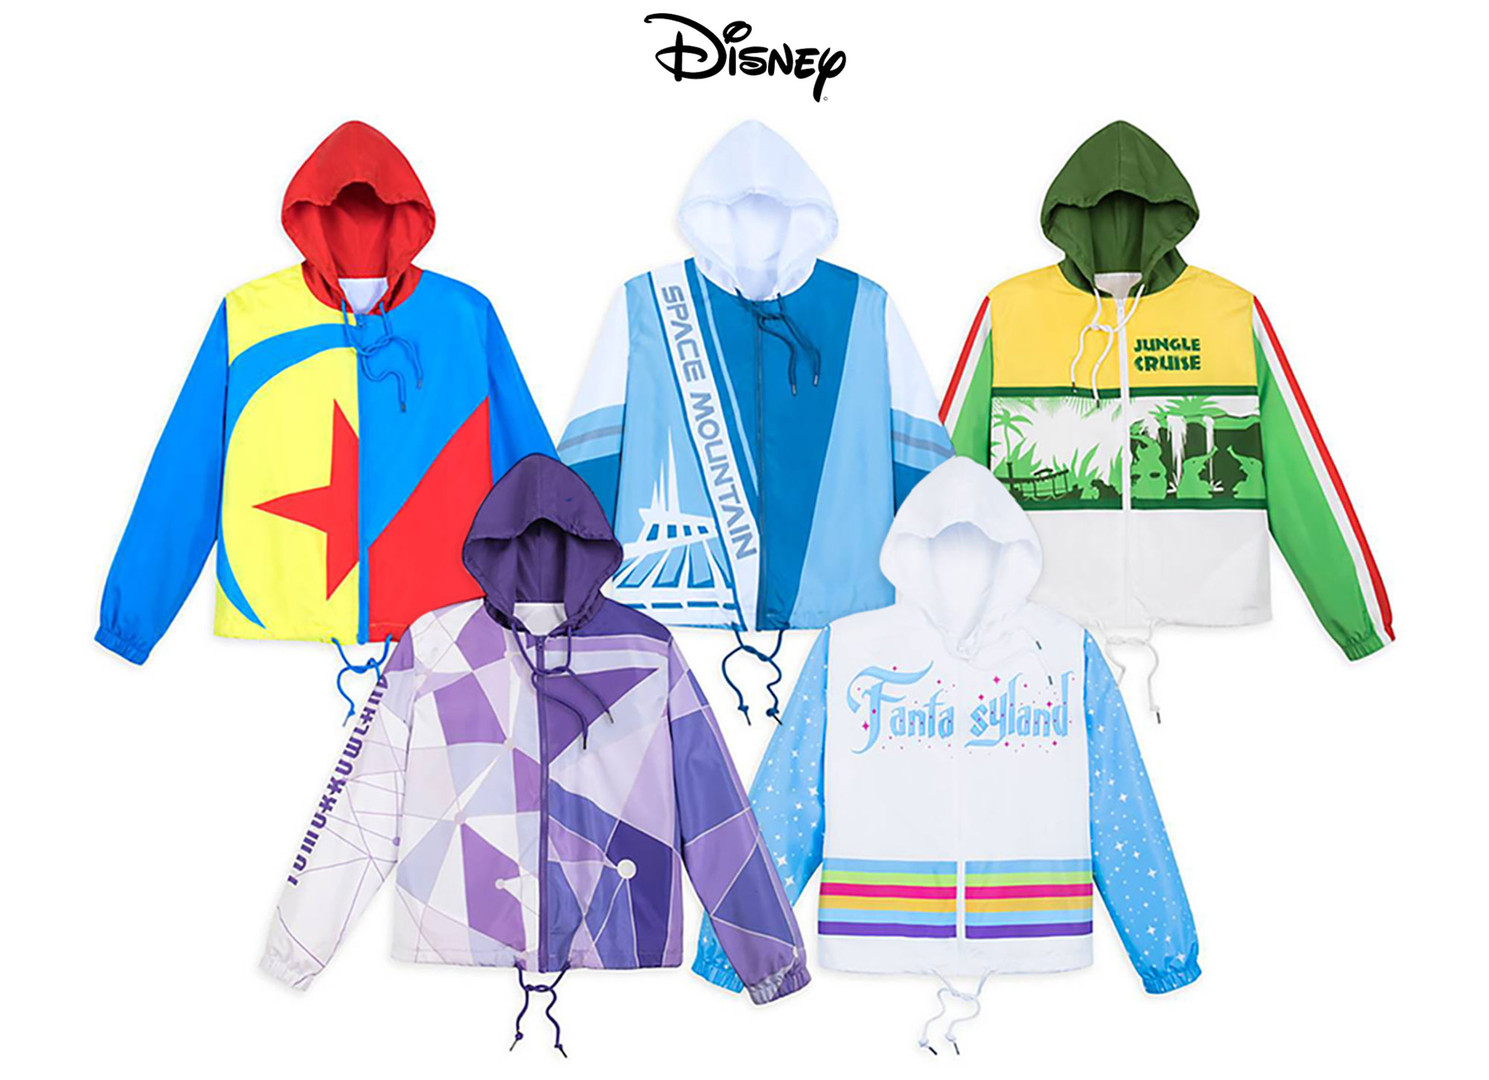 Art development & design of merchandised women's Disney attraction themed windbreakers sold at Disney Parks & Resort and shopdisney.com